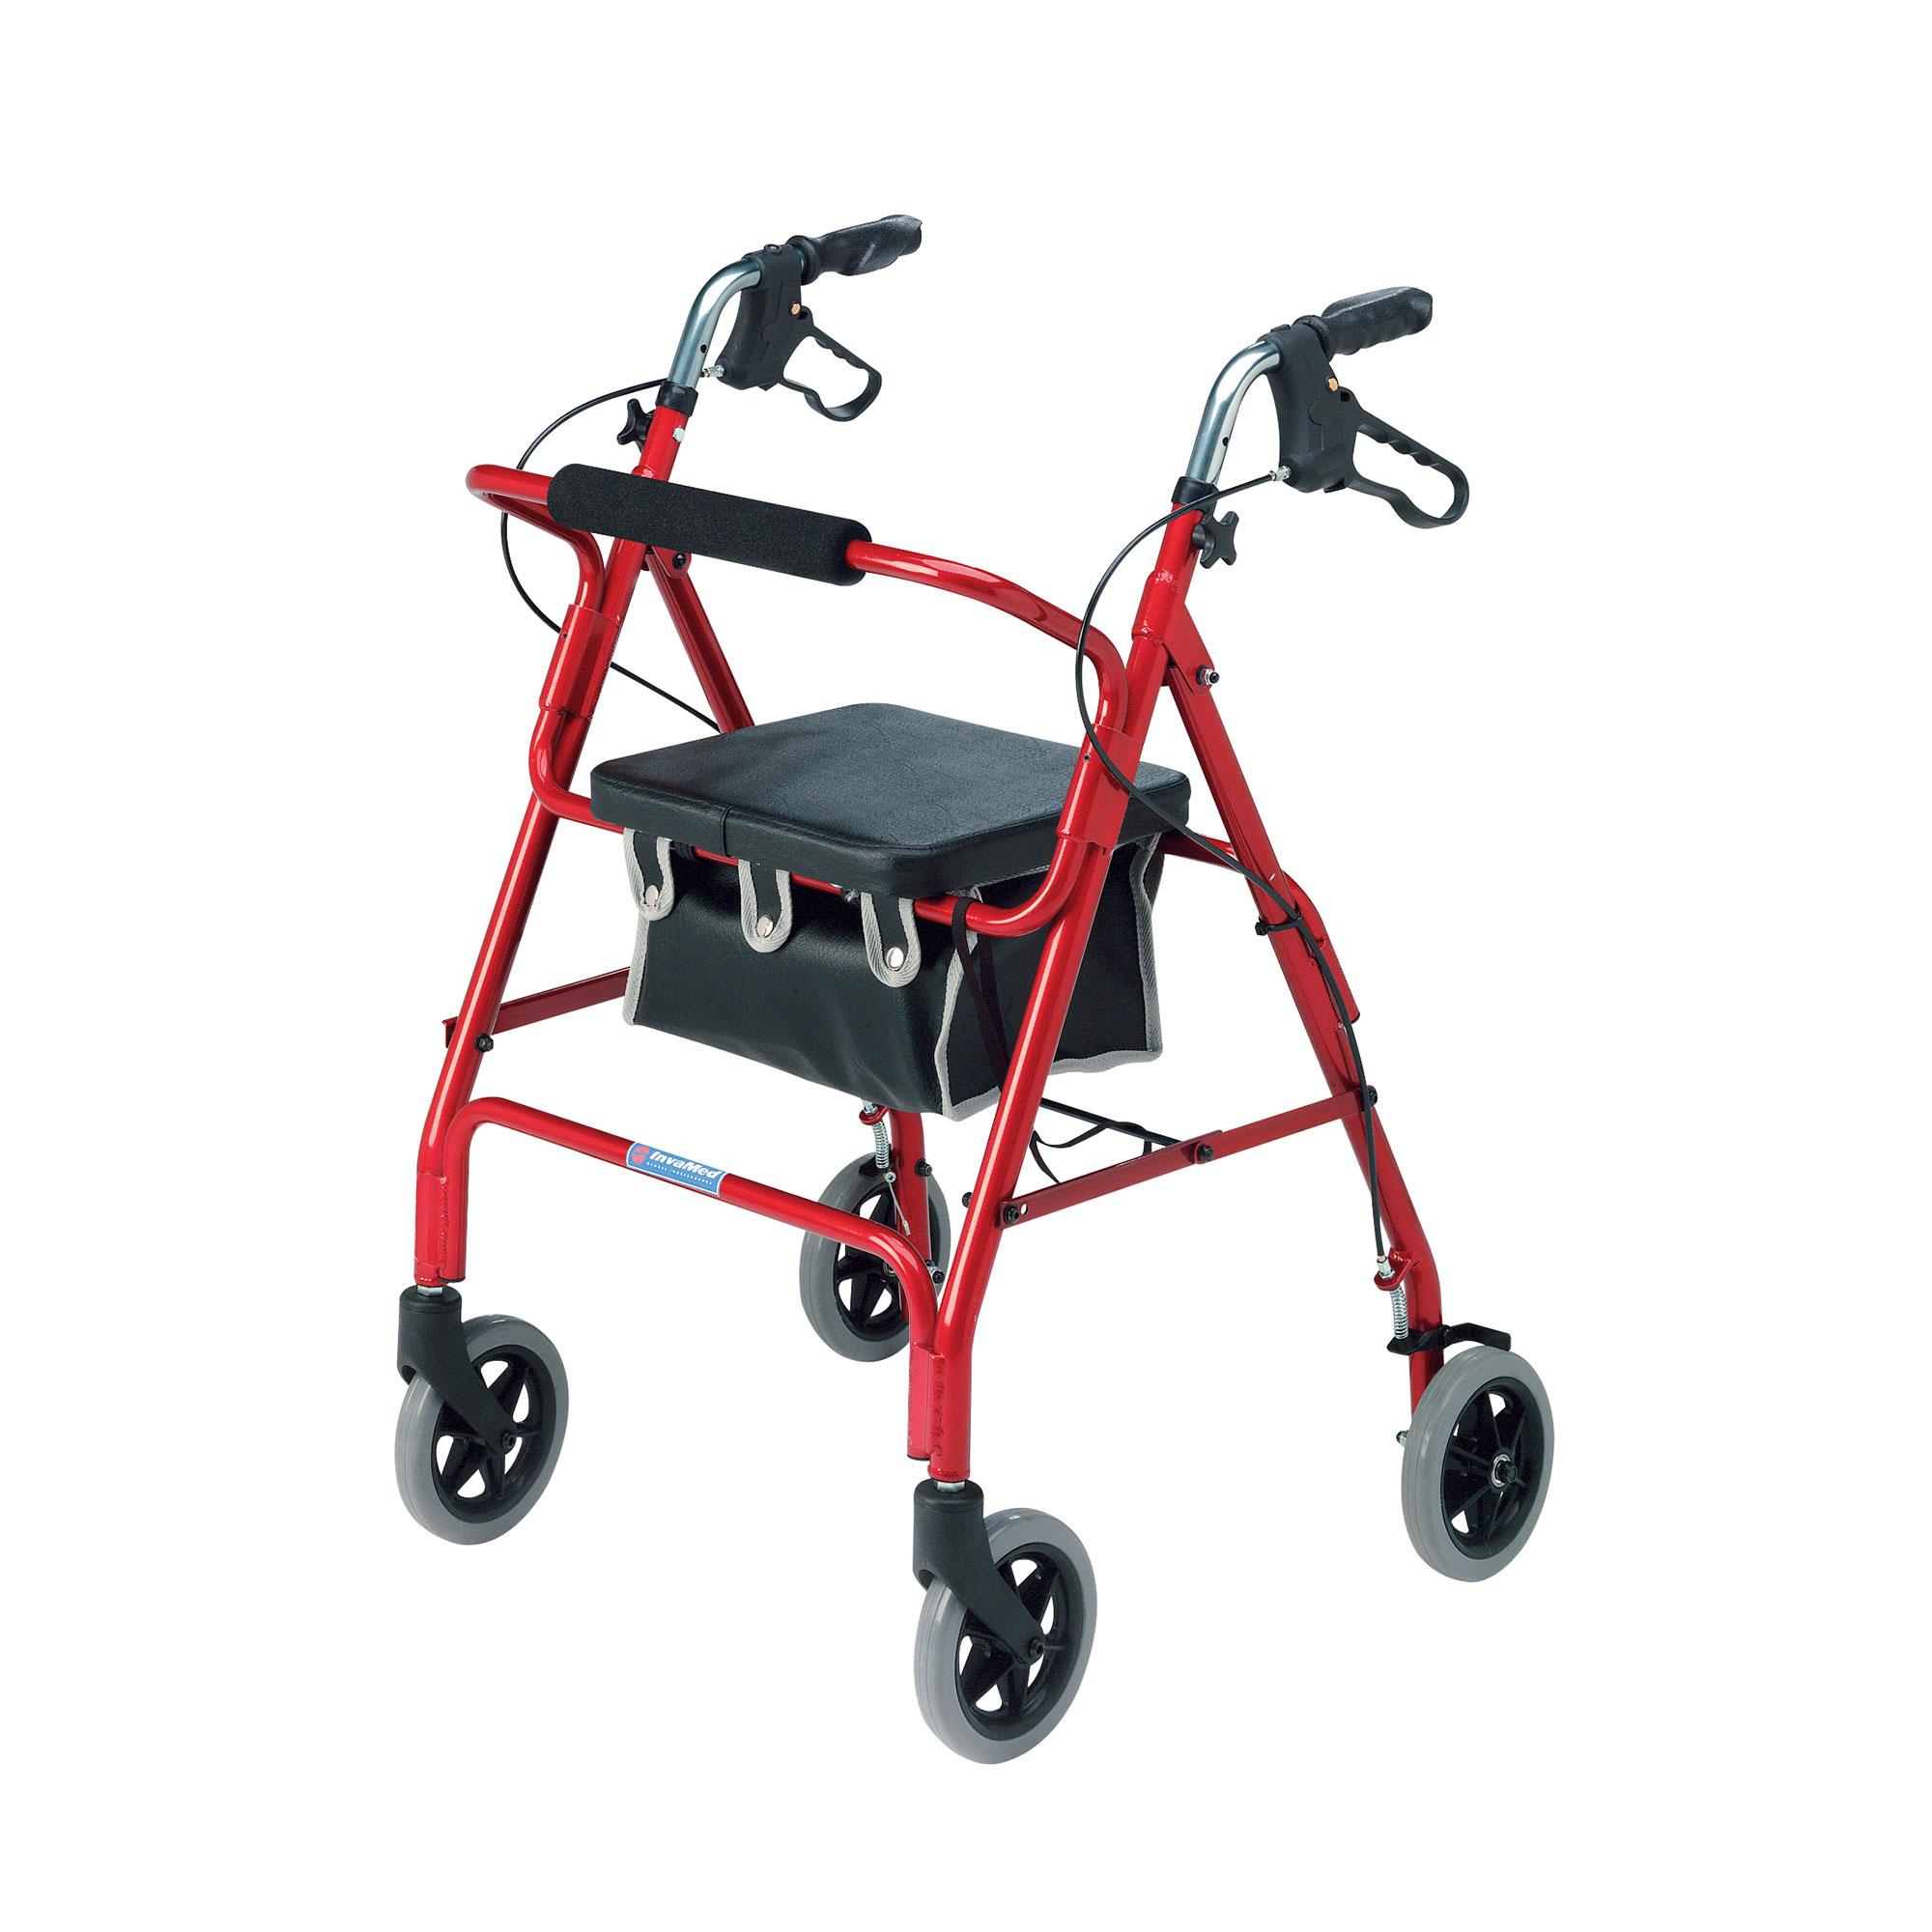 2462 Lightweight 4 Wheel Rollator Roma Medical